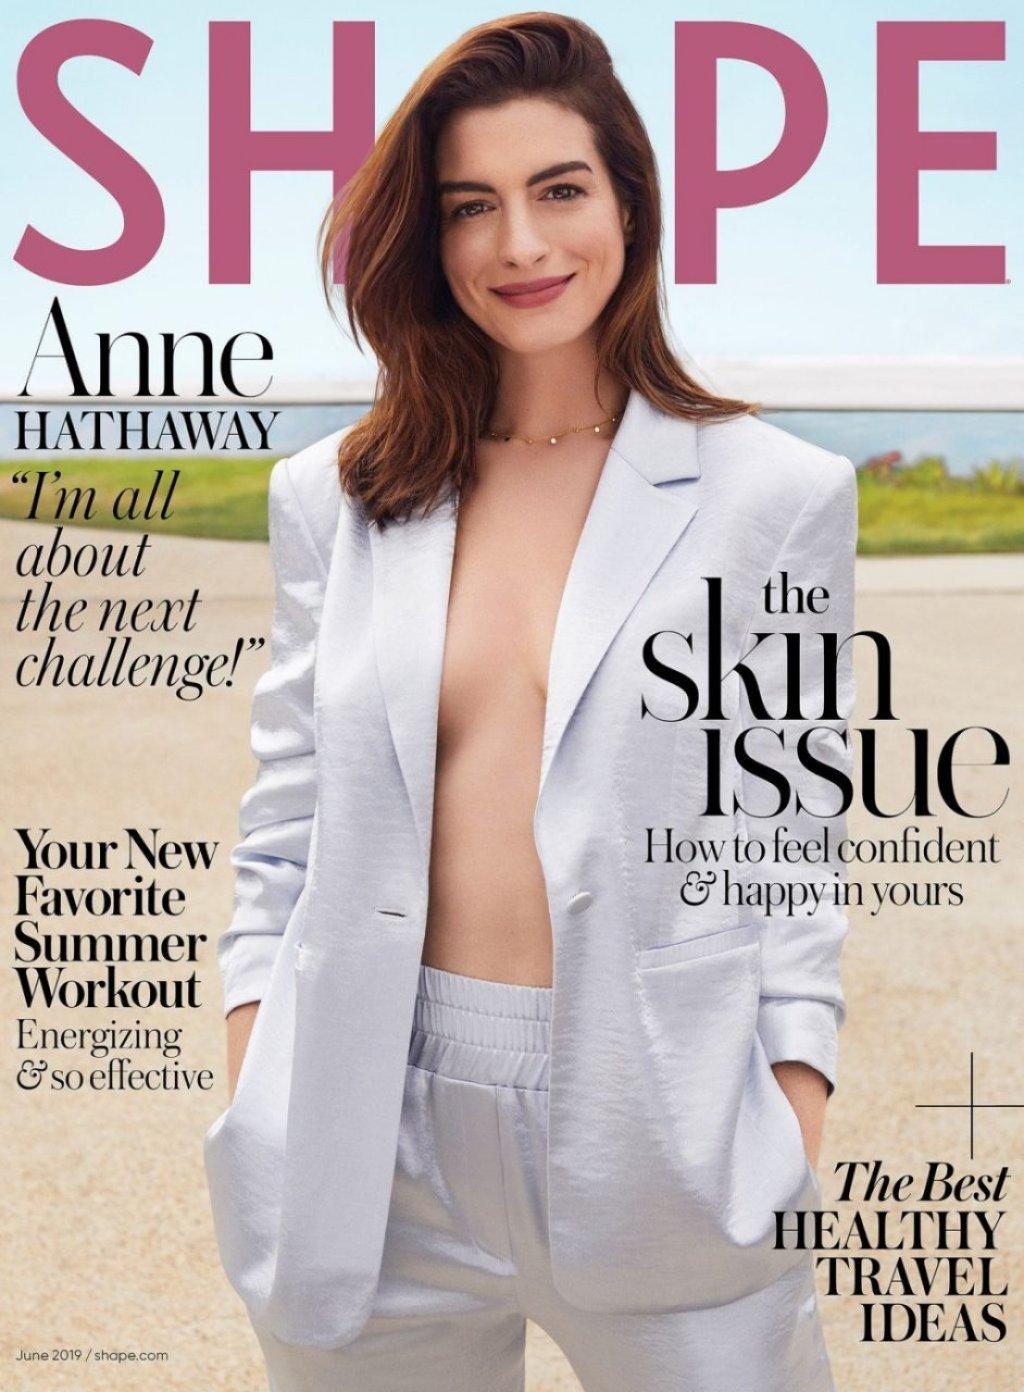 Anne Hathaway Sexy (7 Photos)